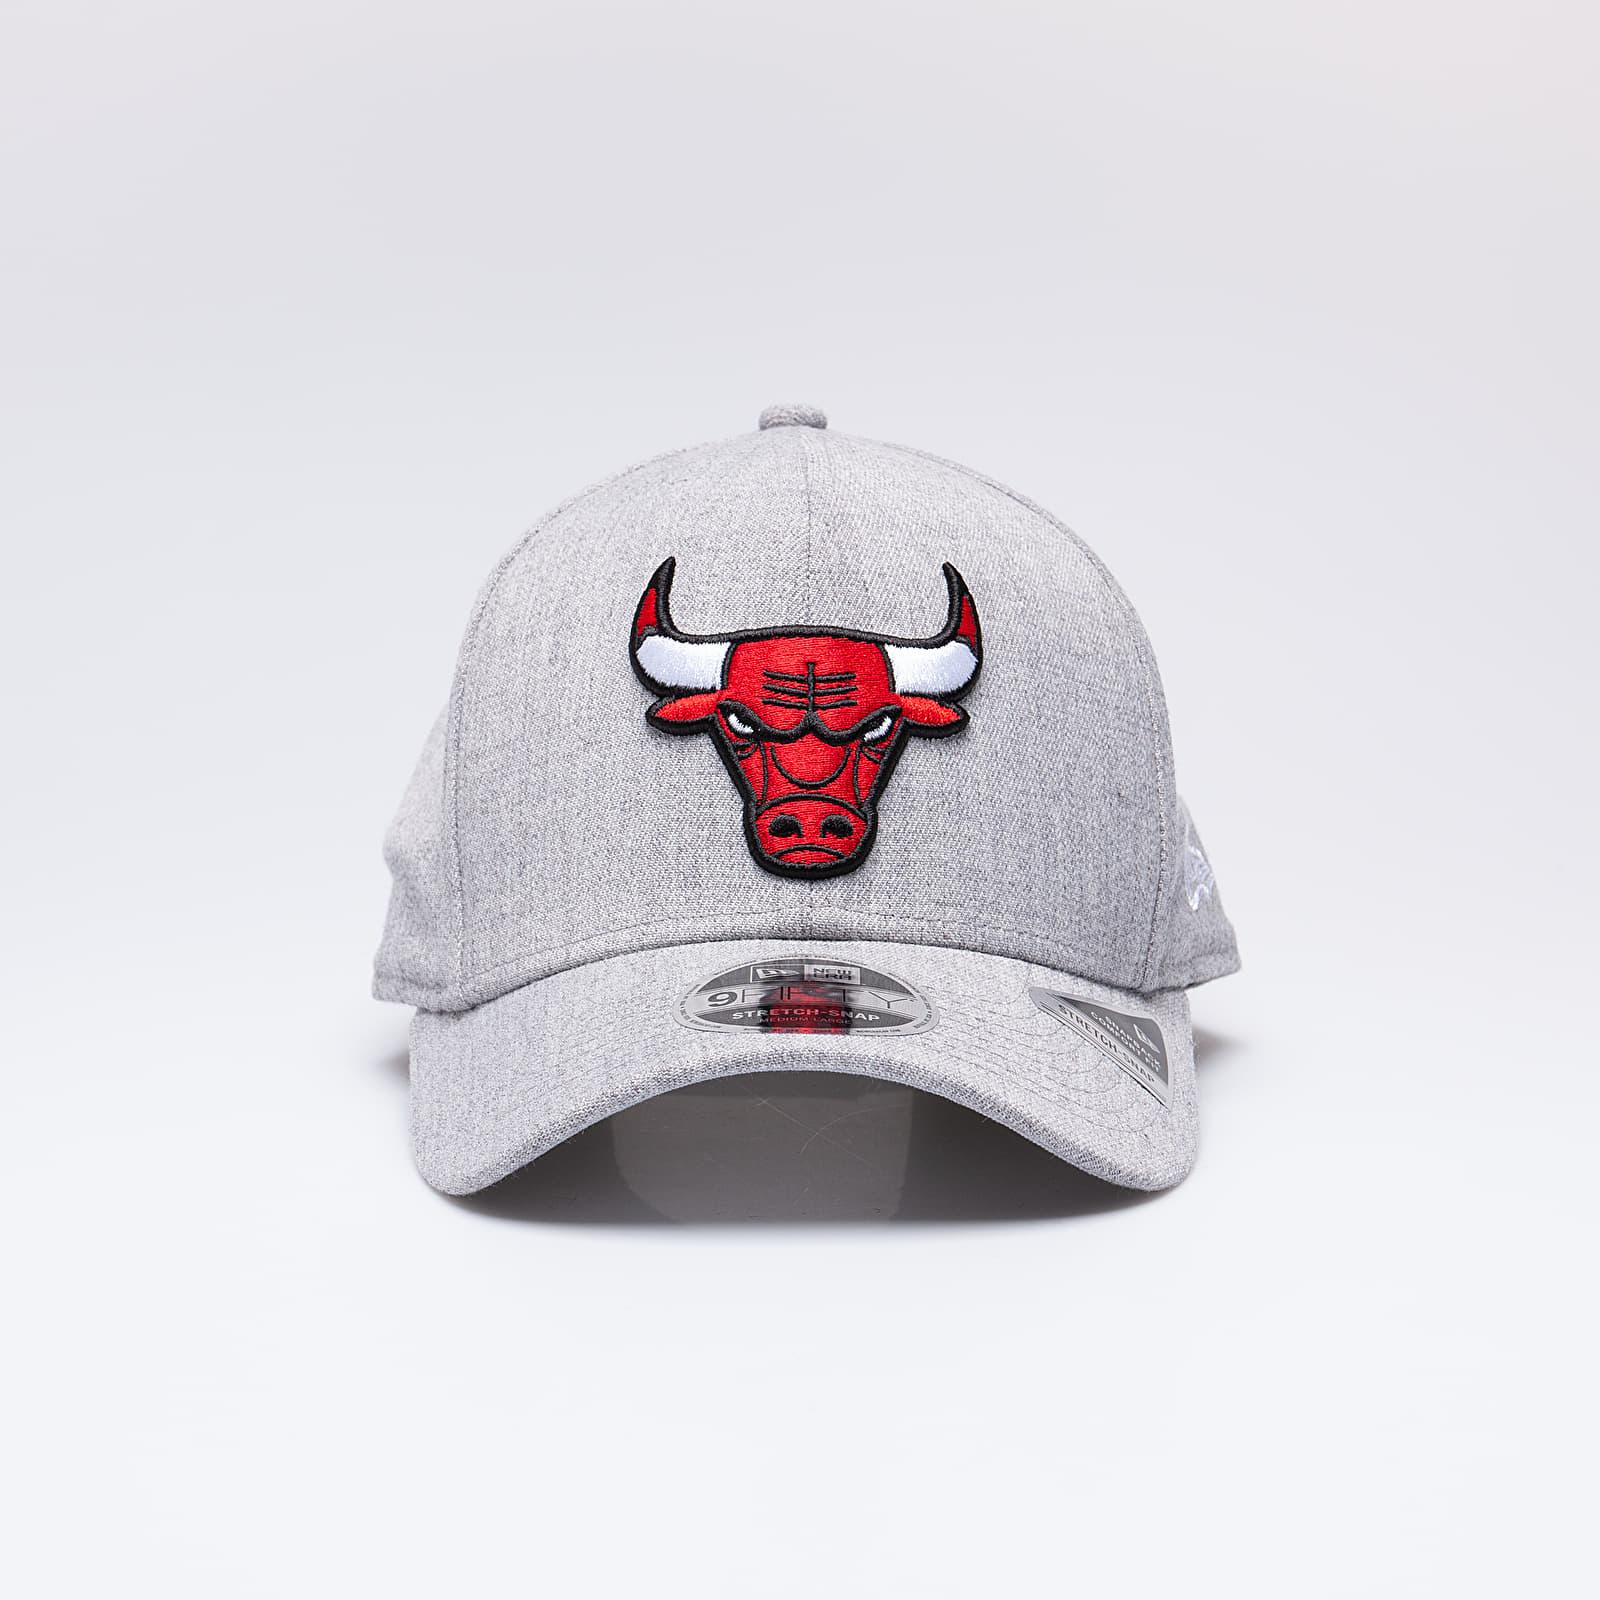 New Era 9Fifty NBA Heather Base Chicago Bulls Cap